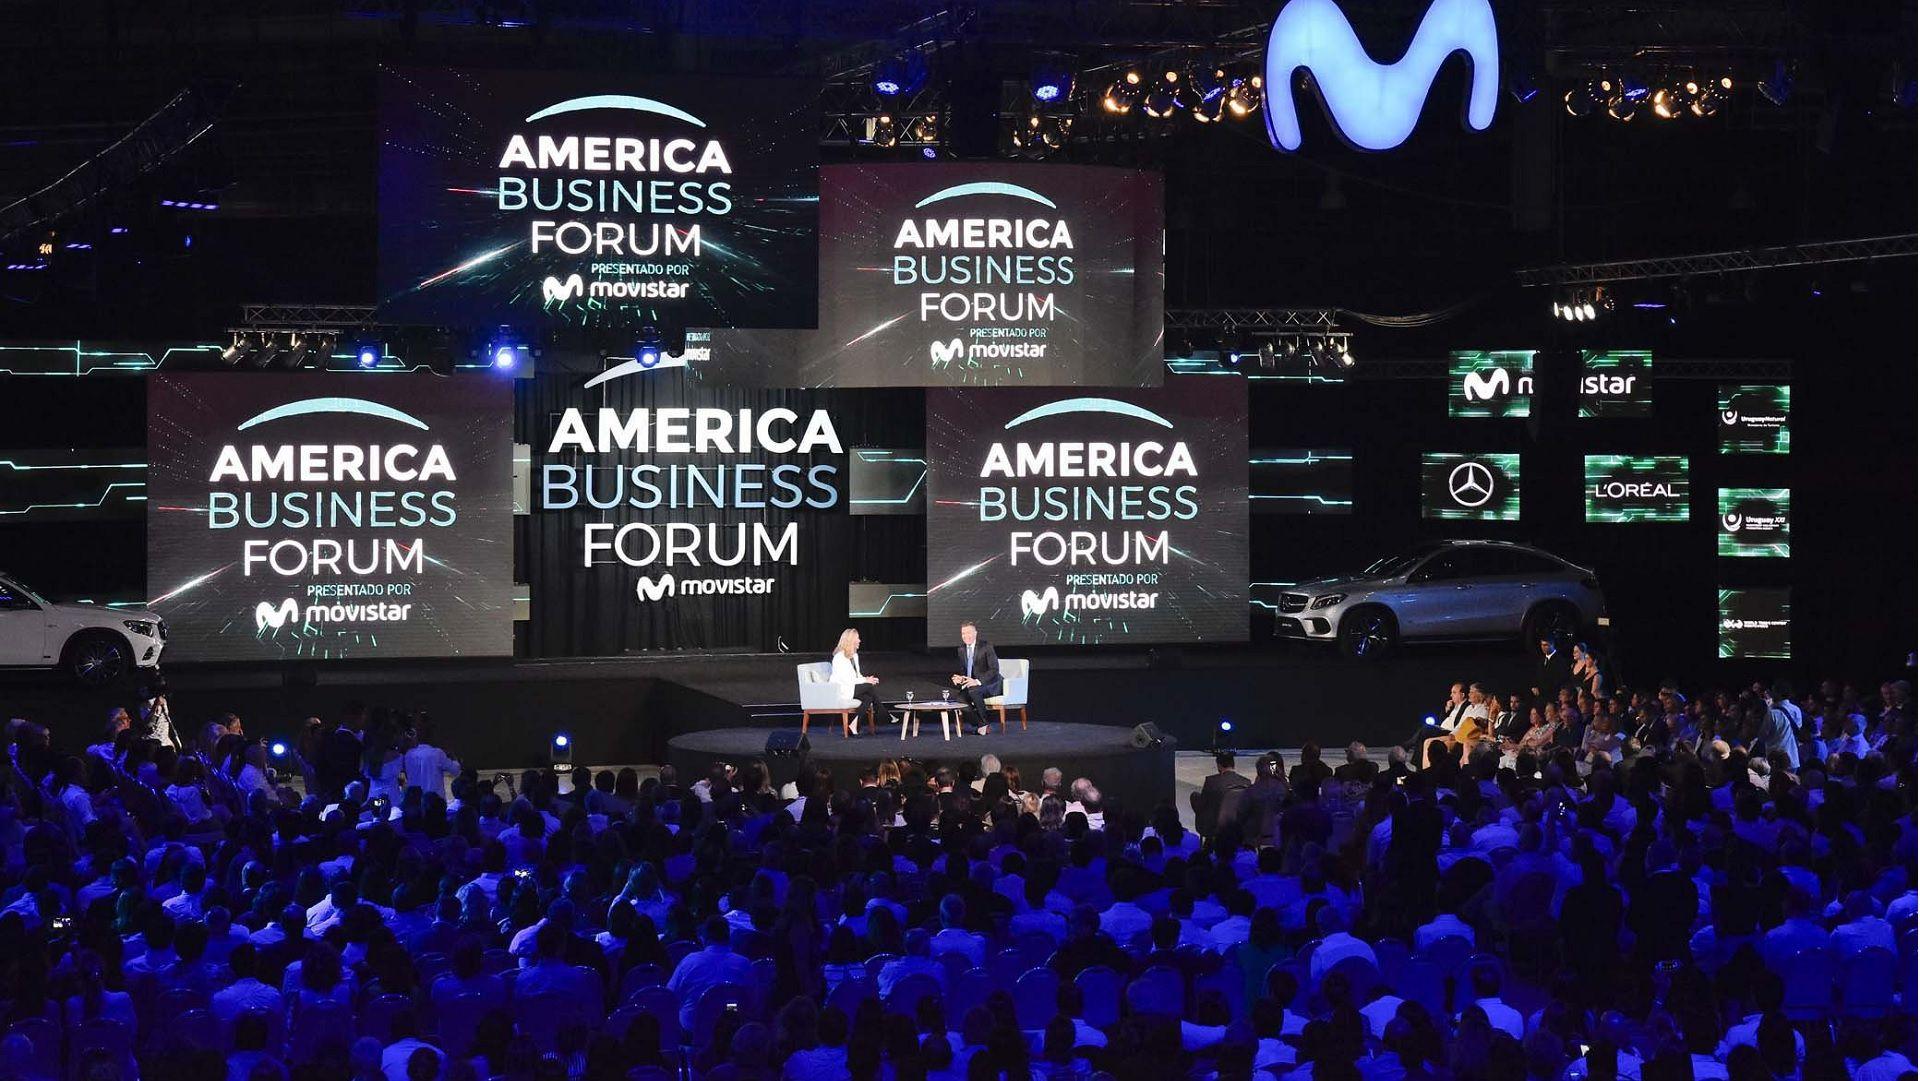 America Business Forum